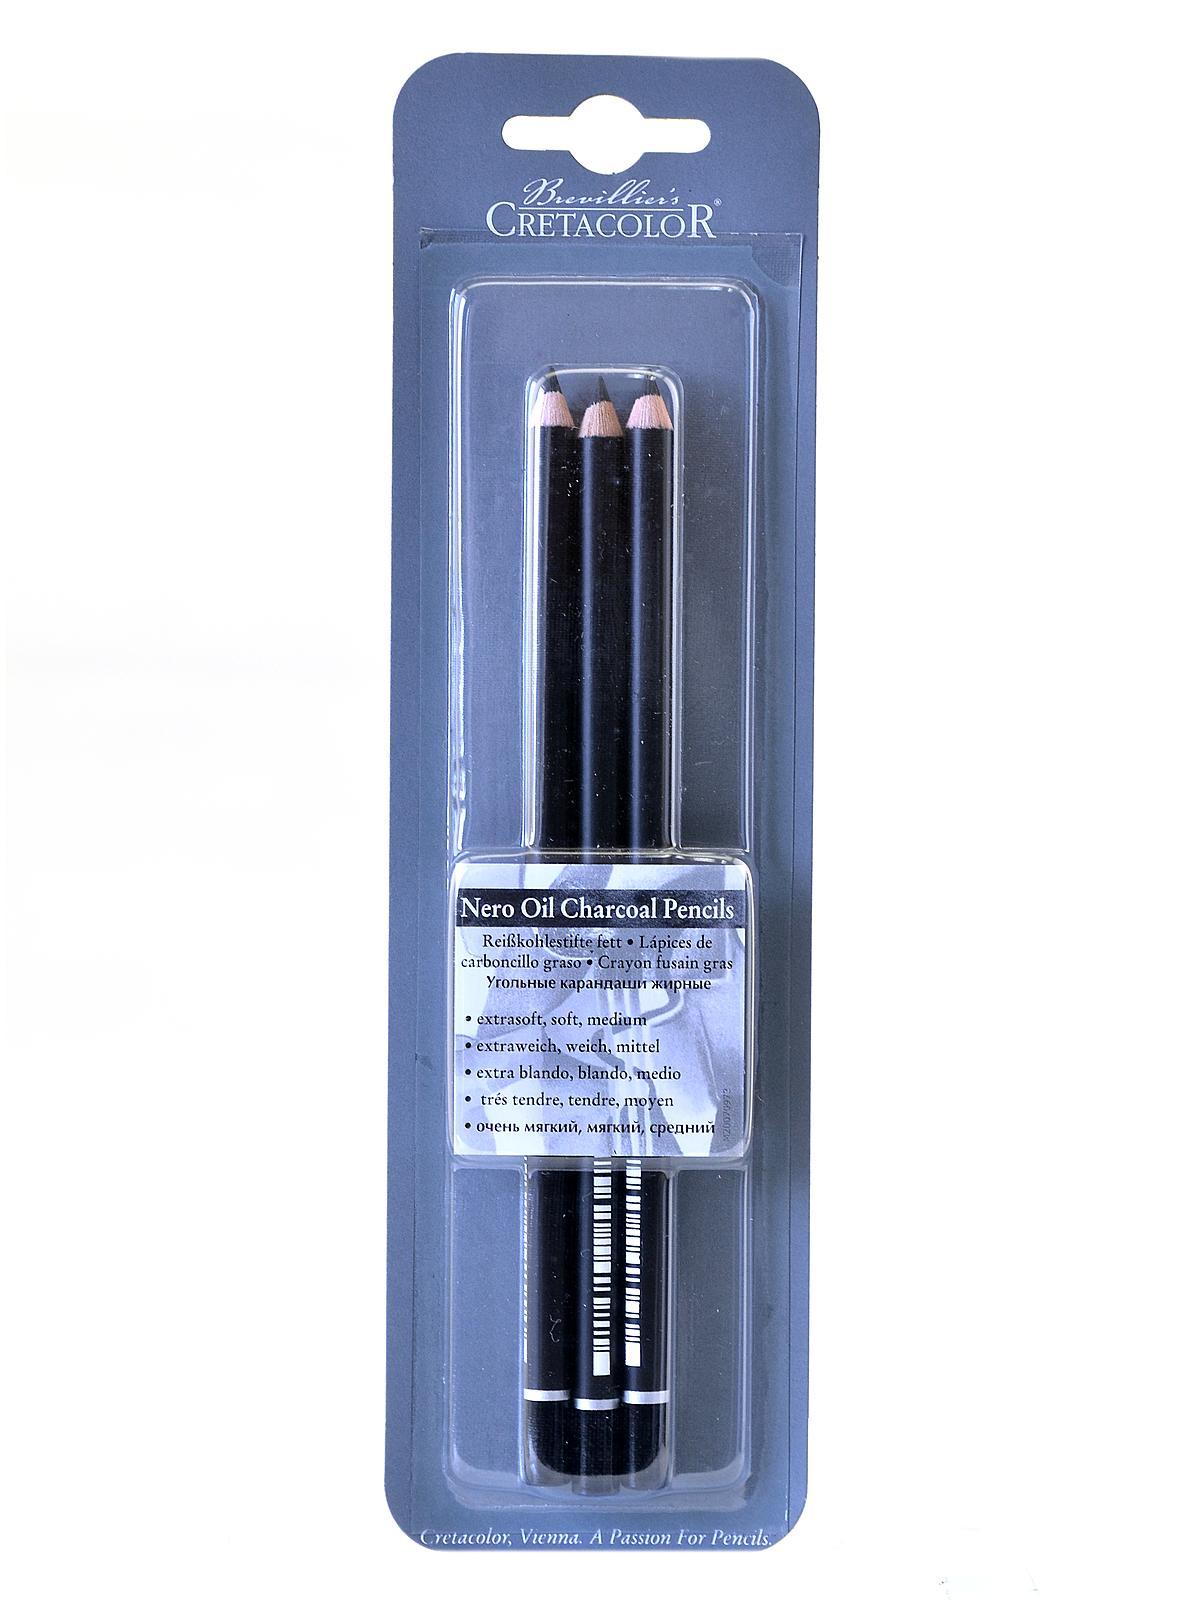 Cretacolor - Nero Oil Charcoal Set